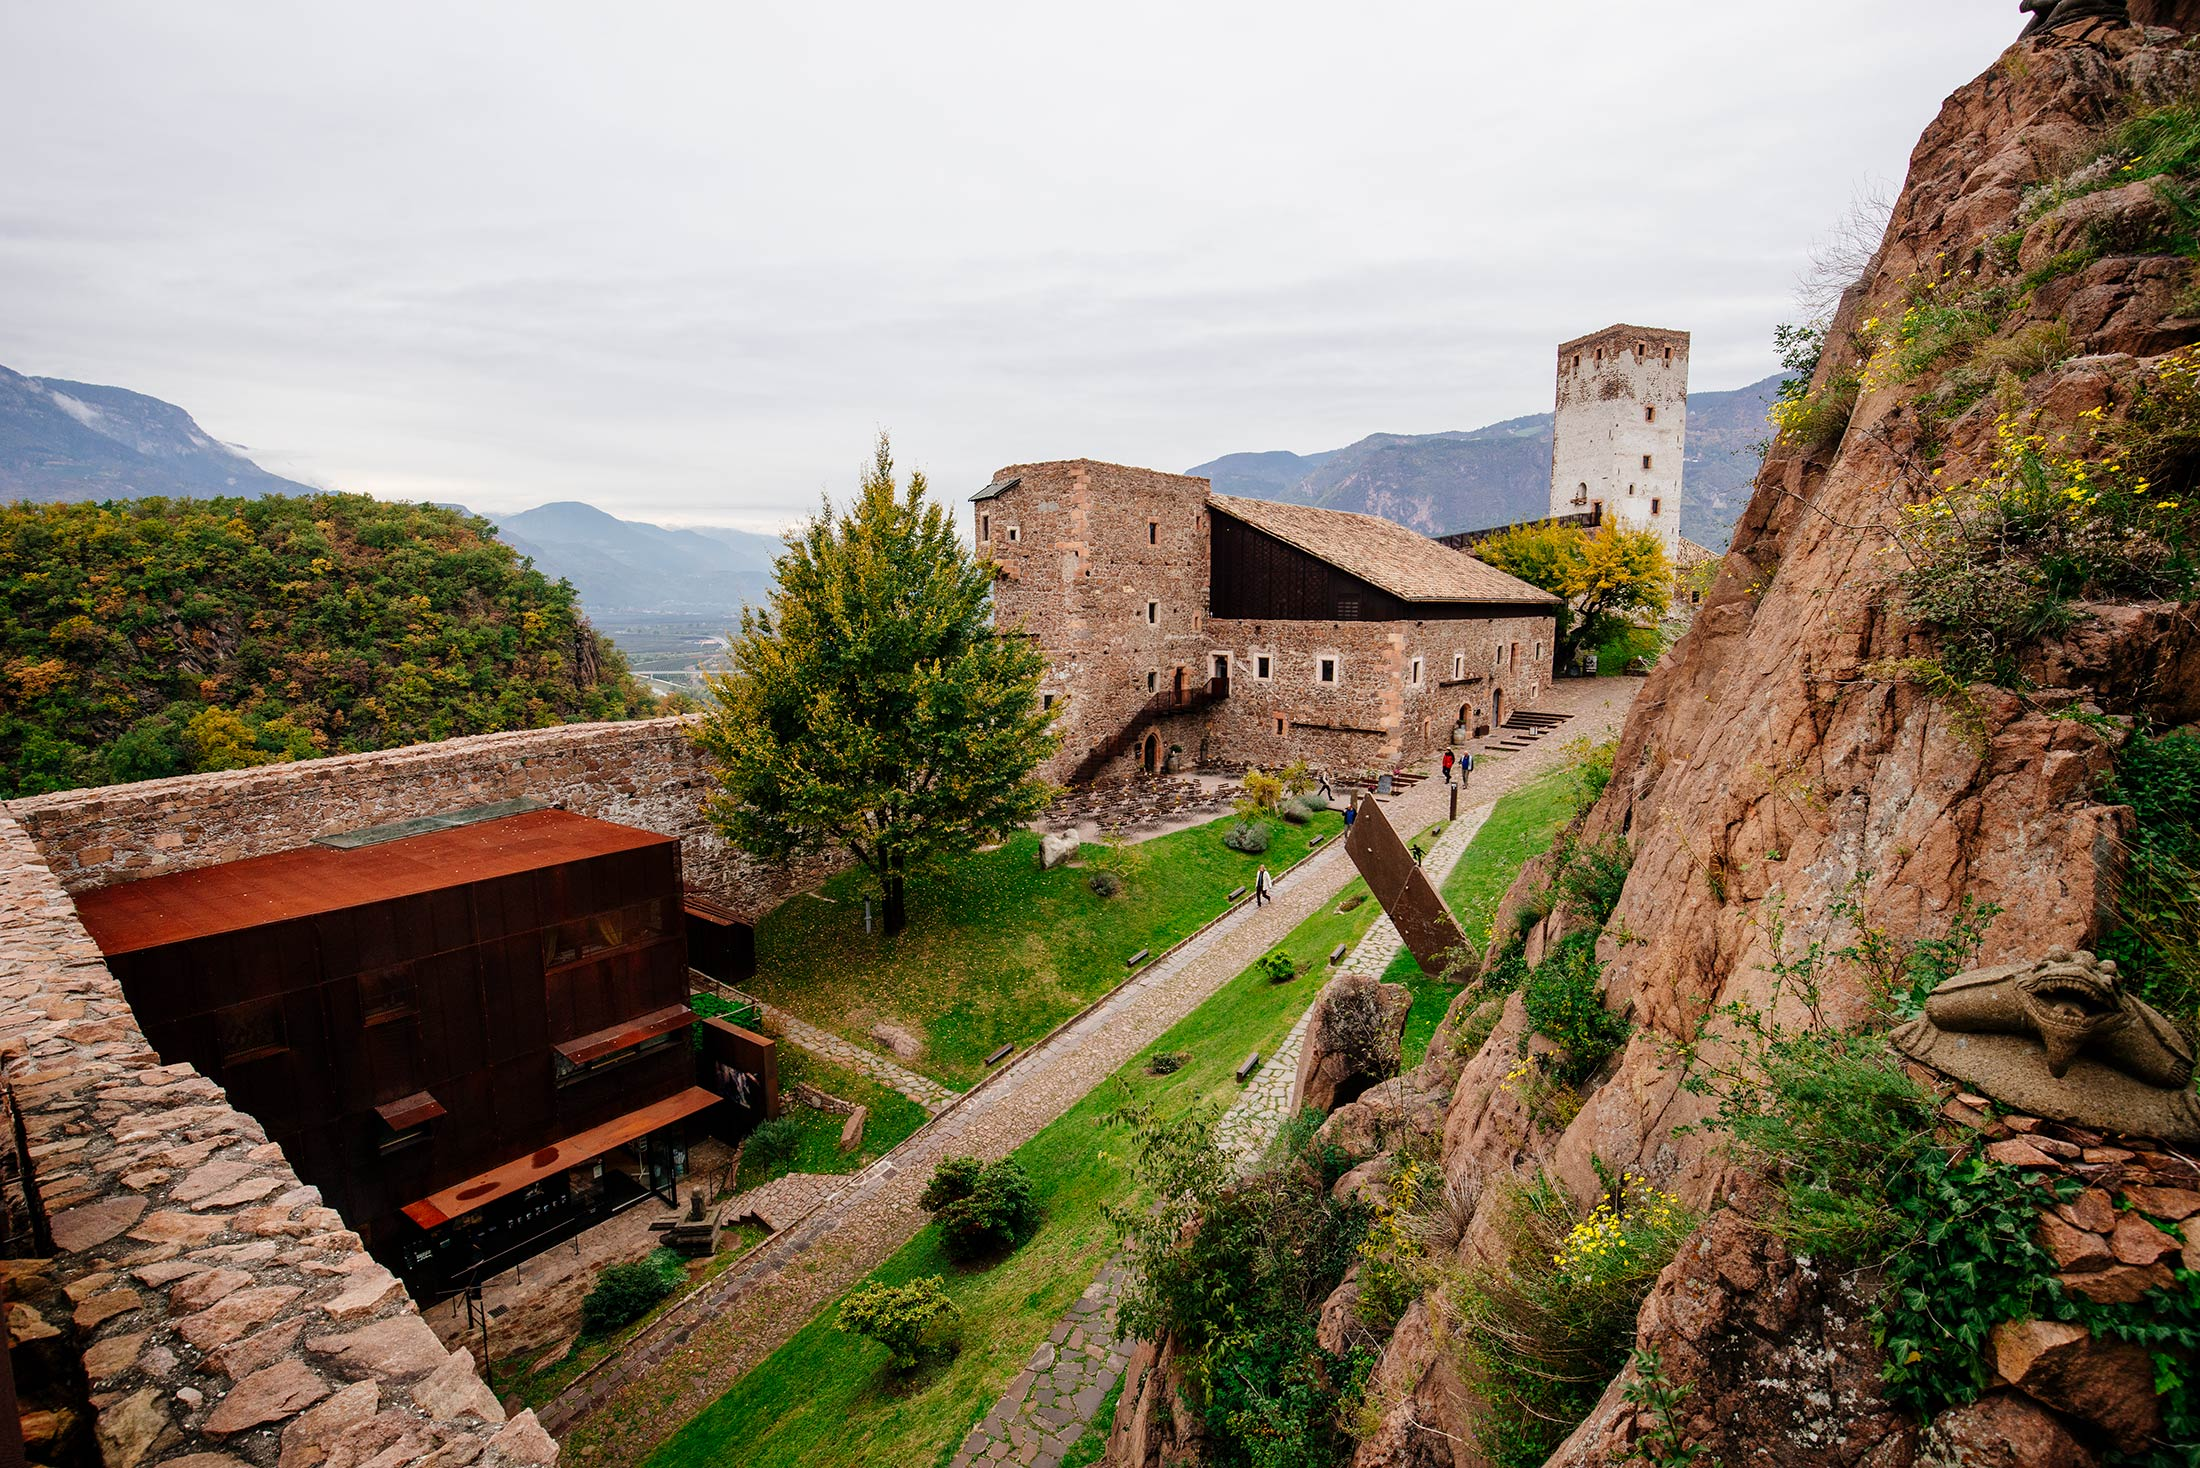 Messner_Mountain_Museum_17-Mitja_Schneehage